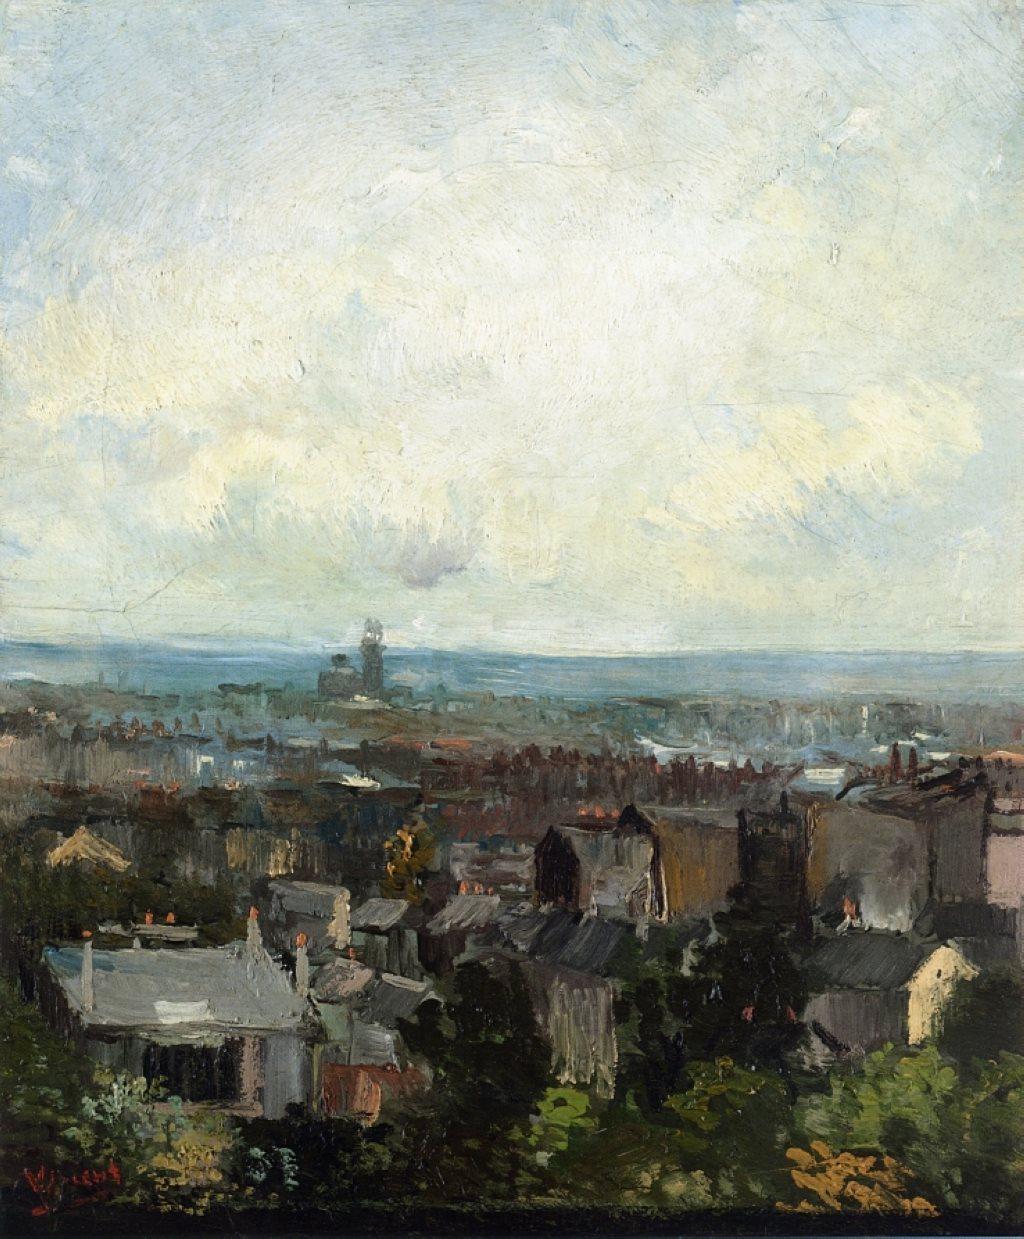 Van Gogh, Rooftops in Paris, Spring 1886. Oil on canvas, 45.6 x 38.5 cm. National Gallery of Ireland, Dublin.